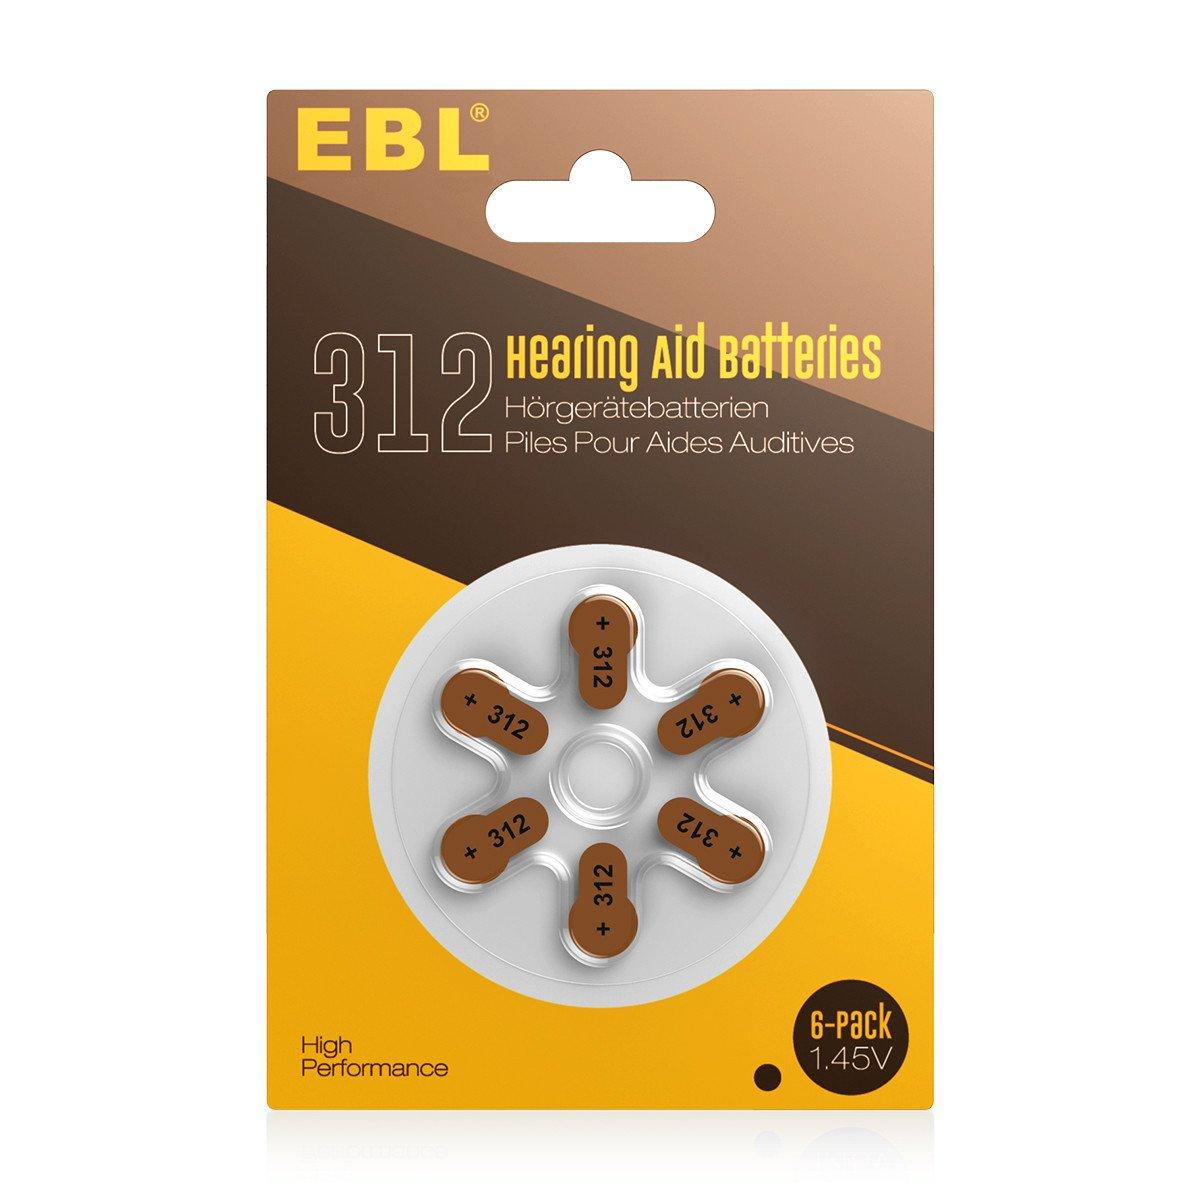 EBL Hearing Aid Batteries Size 312 PR41 60 Pack 1.45V Zinc-Air Battery